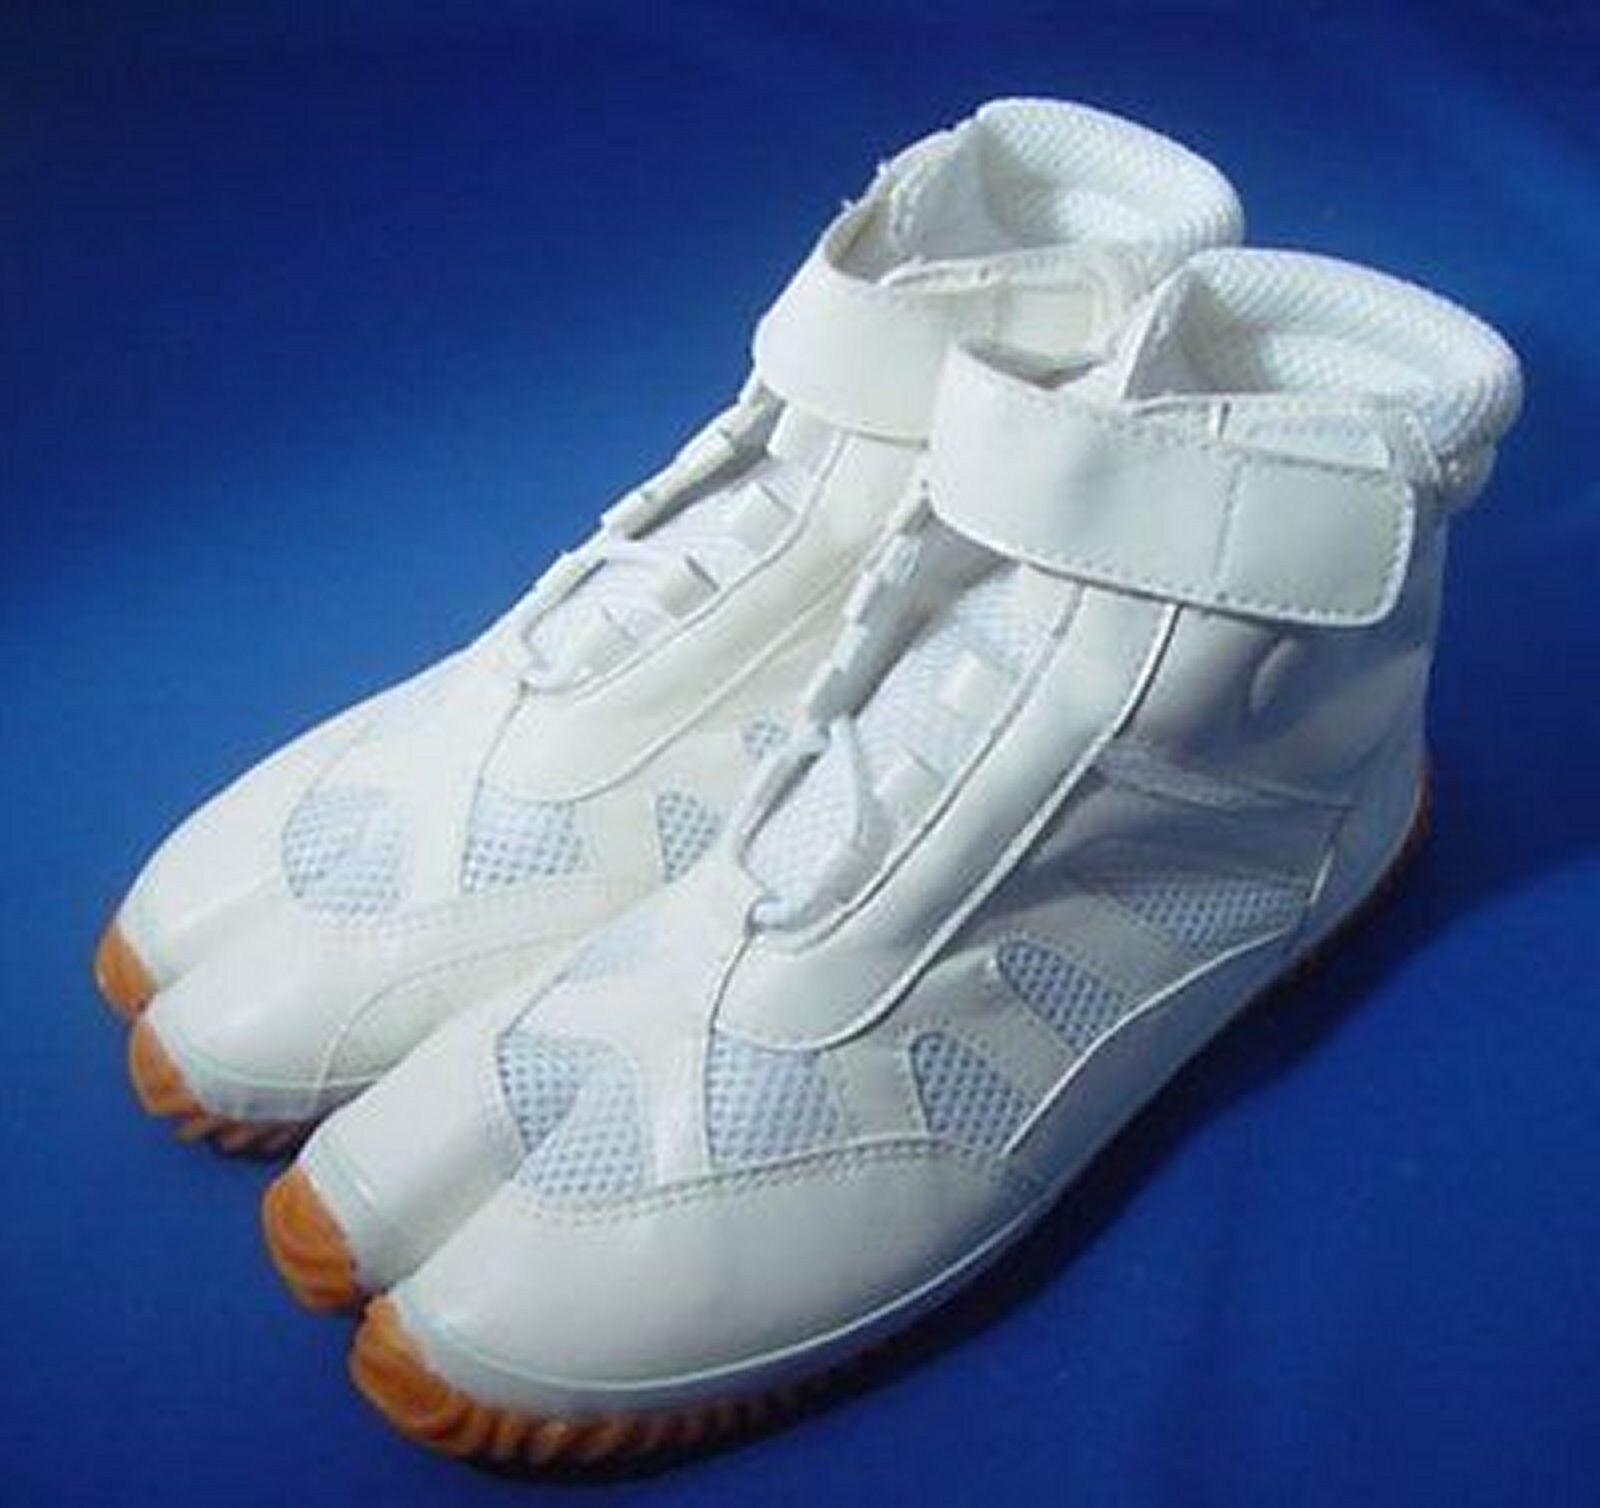 Marugo   Sport Jogs   Tabi Turnschuhe (  Weiß   Weiß )